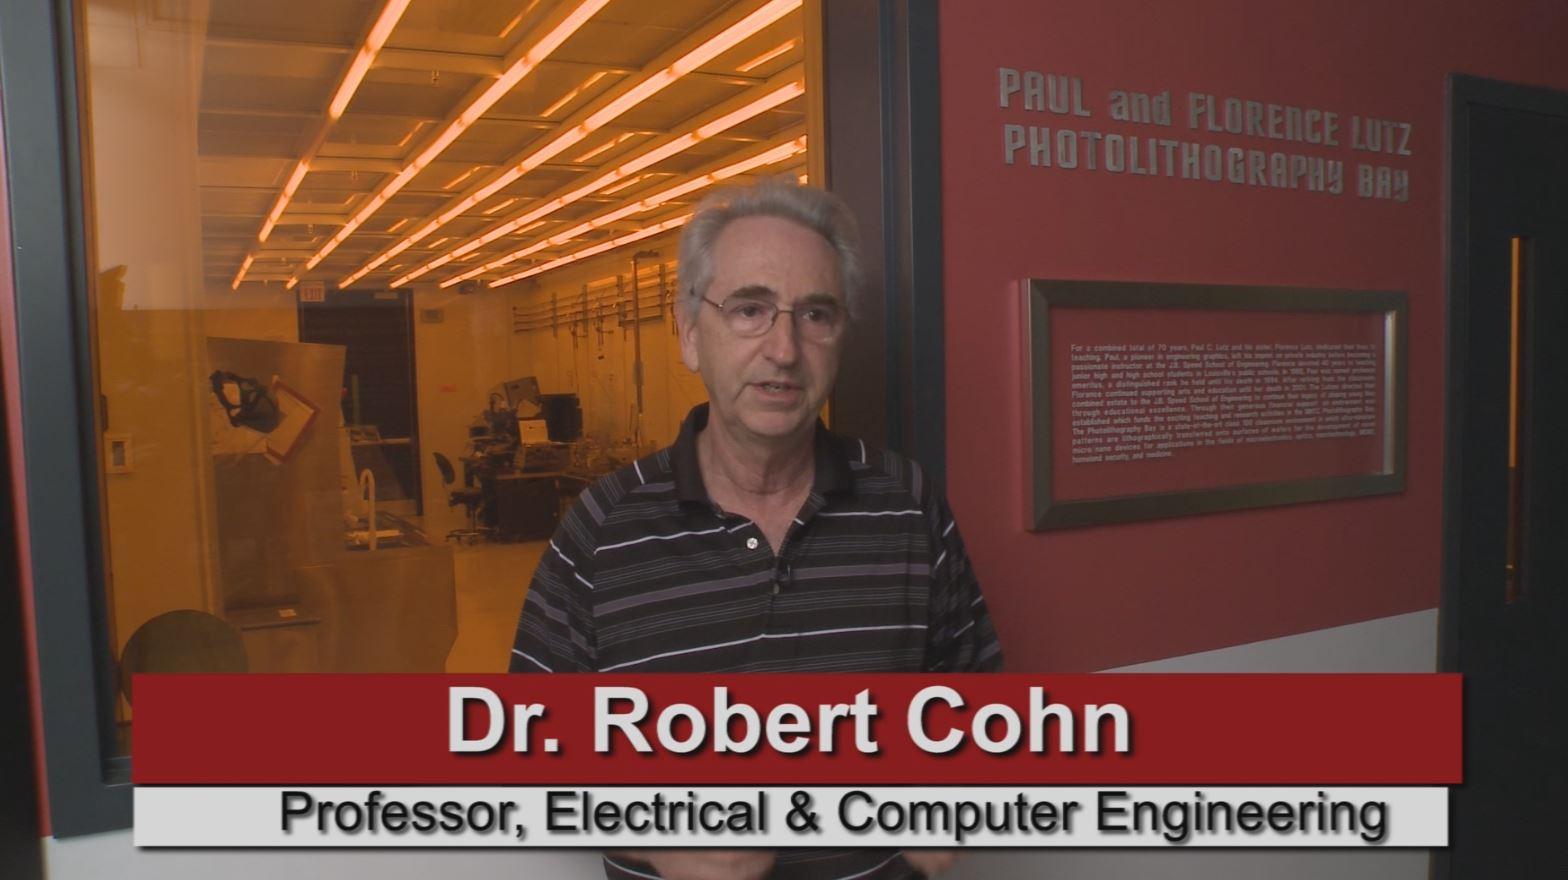 Nano Nuggets - Dr. Cohn - Bioengineered Materials and Soft Materilas